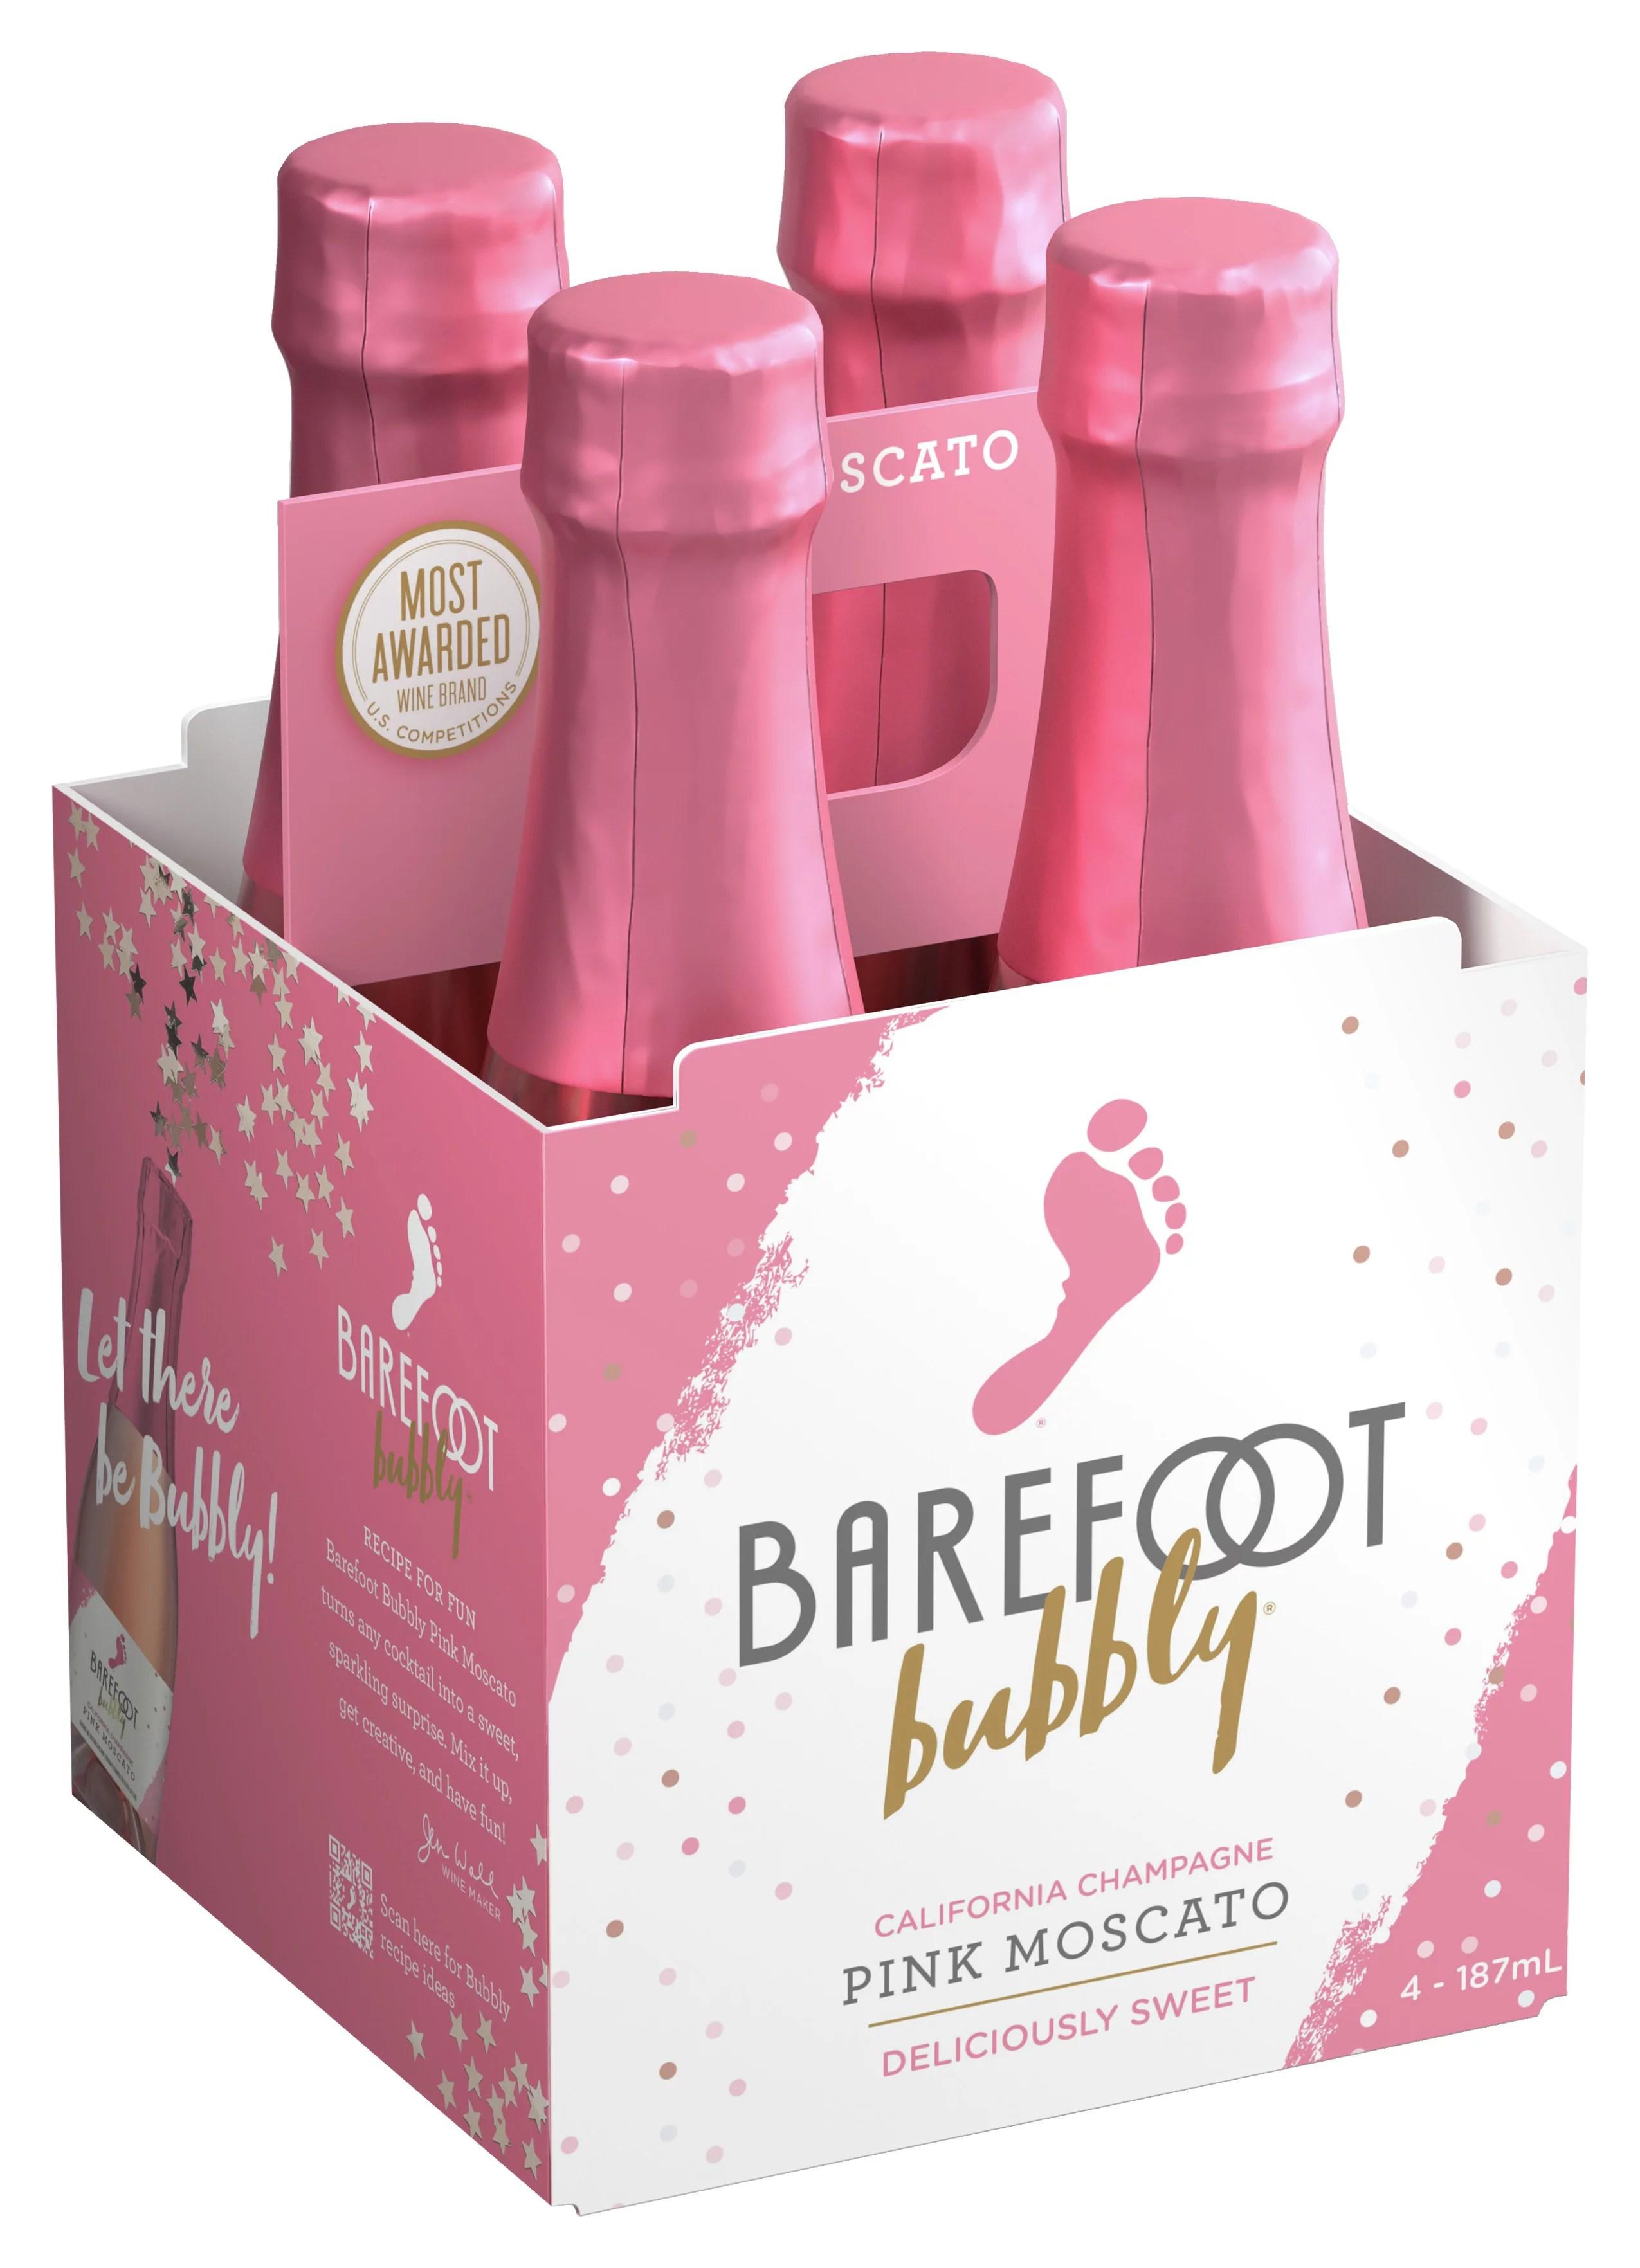 Barefoot Pink Moscato Mini Bottles Walmart : barefoot, moscato, bottles, walmart, Barefoot, Bubbly, Moscato, Wine,, Pack,, Walmart.com, Walmart